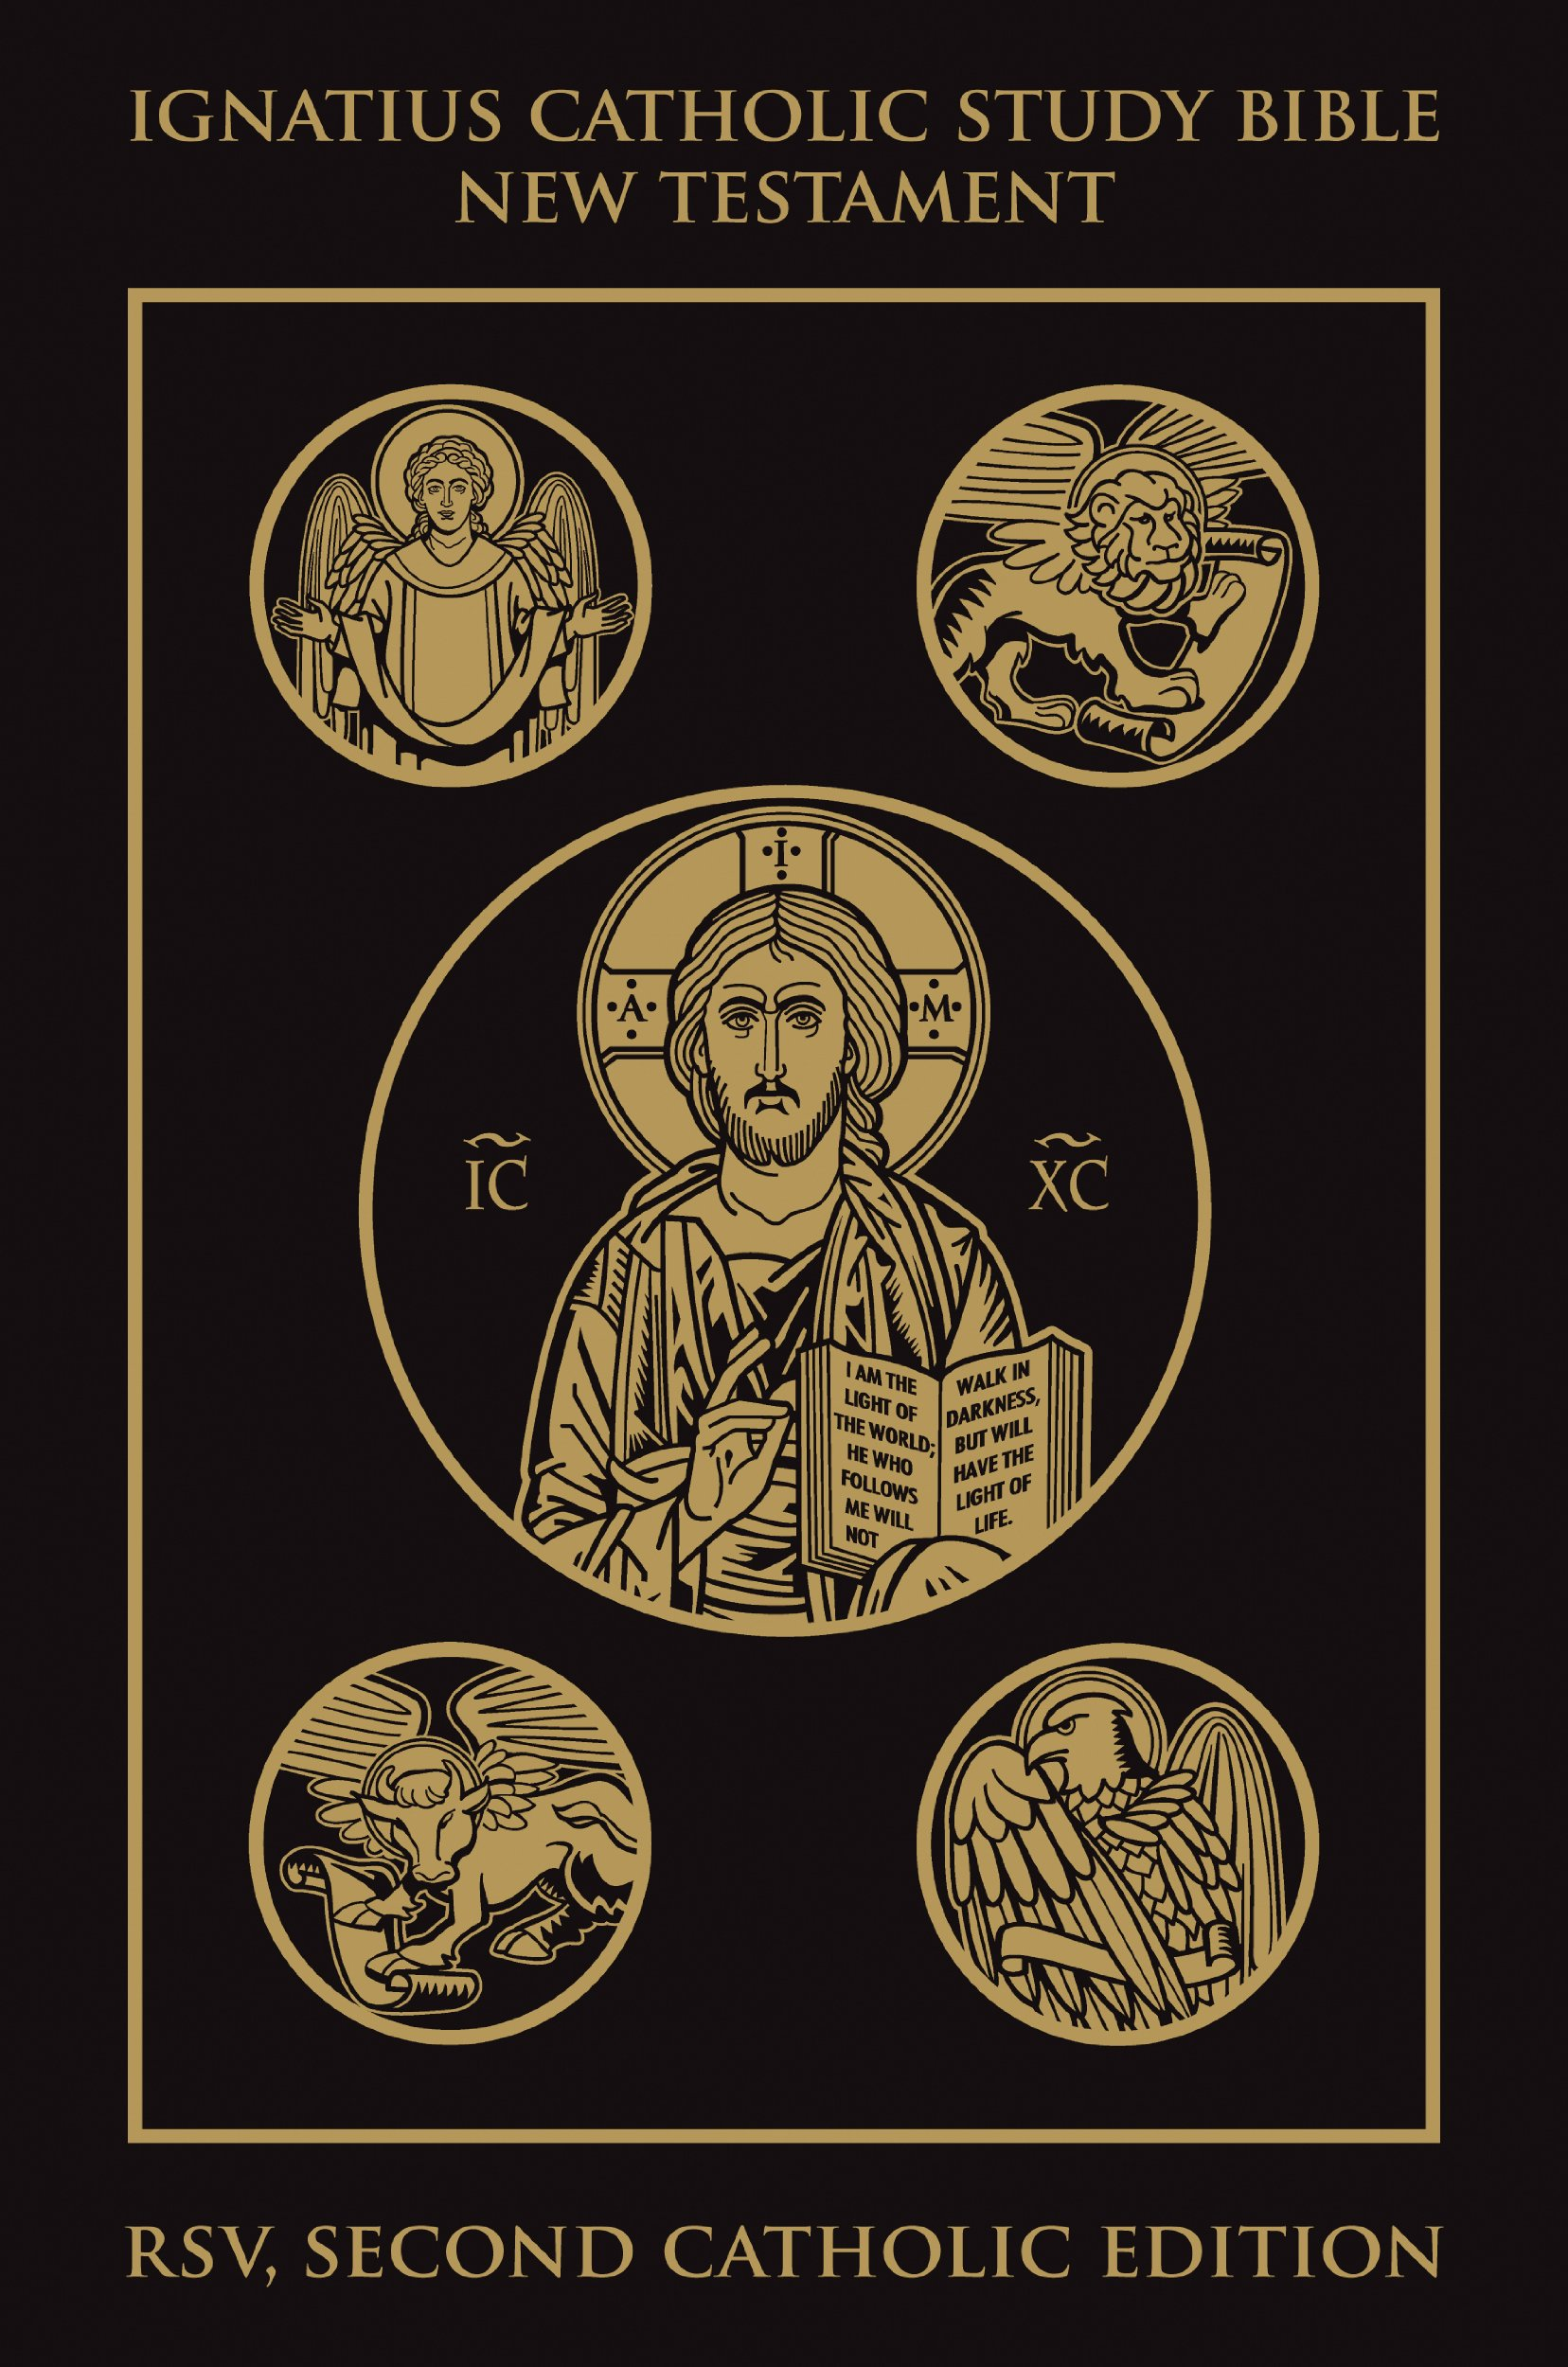 Ignatius Catholic Study Bible: New Testament: Curtis Mitch